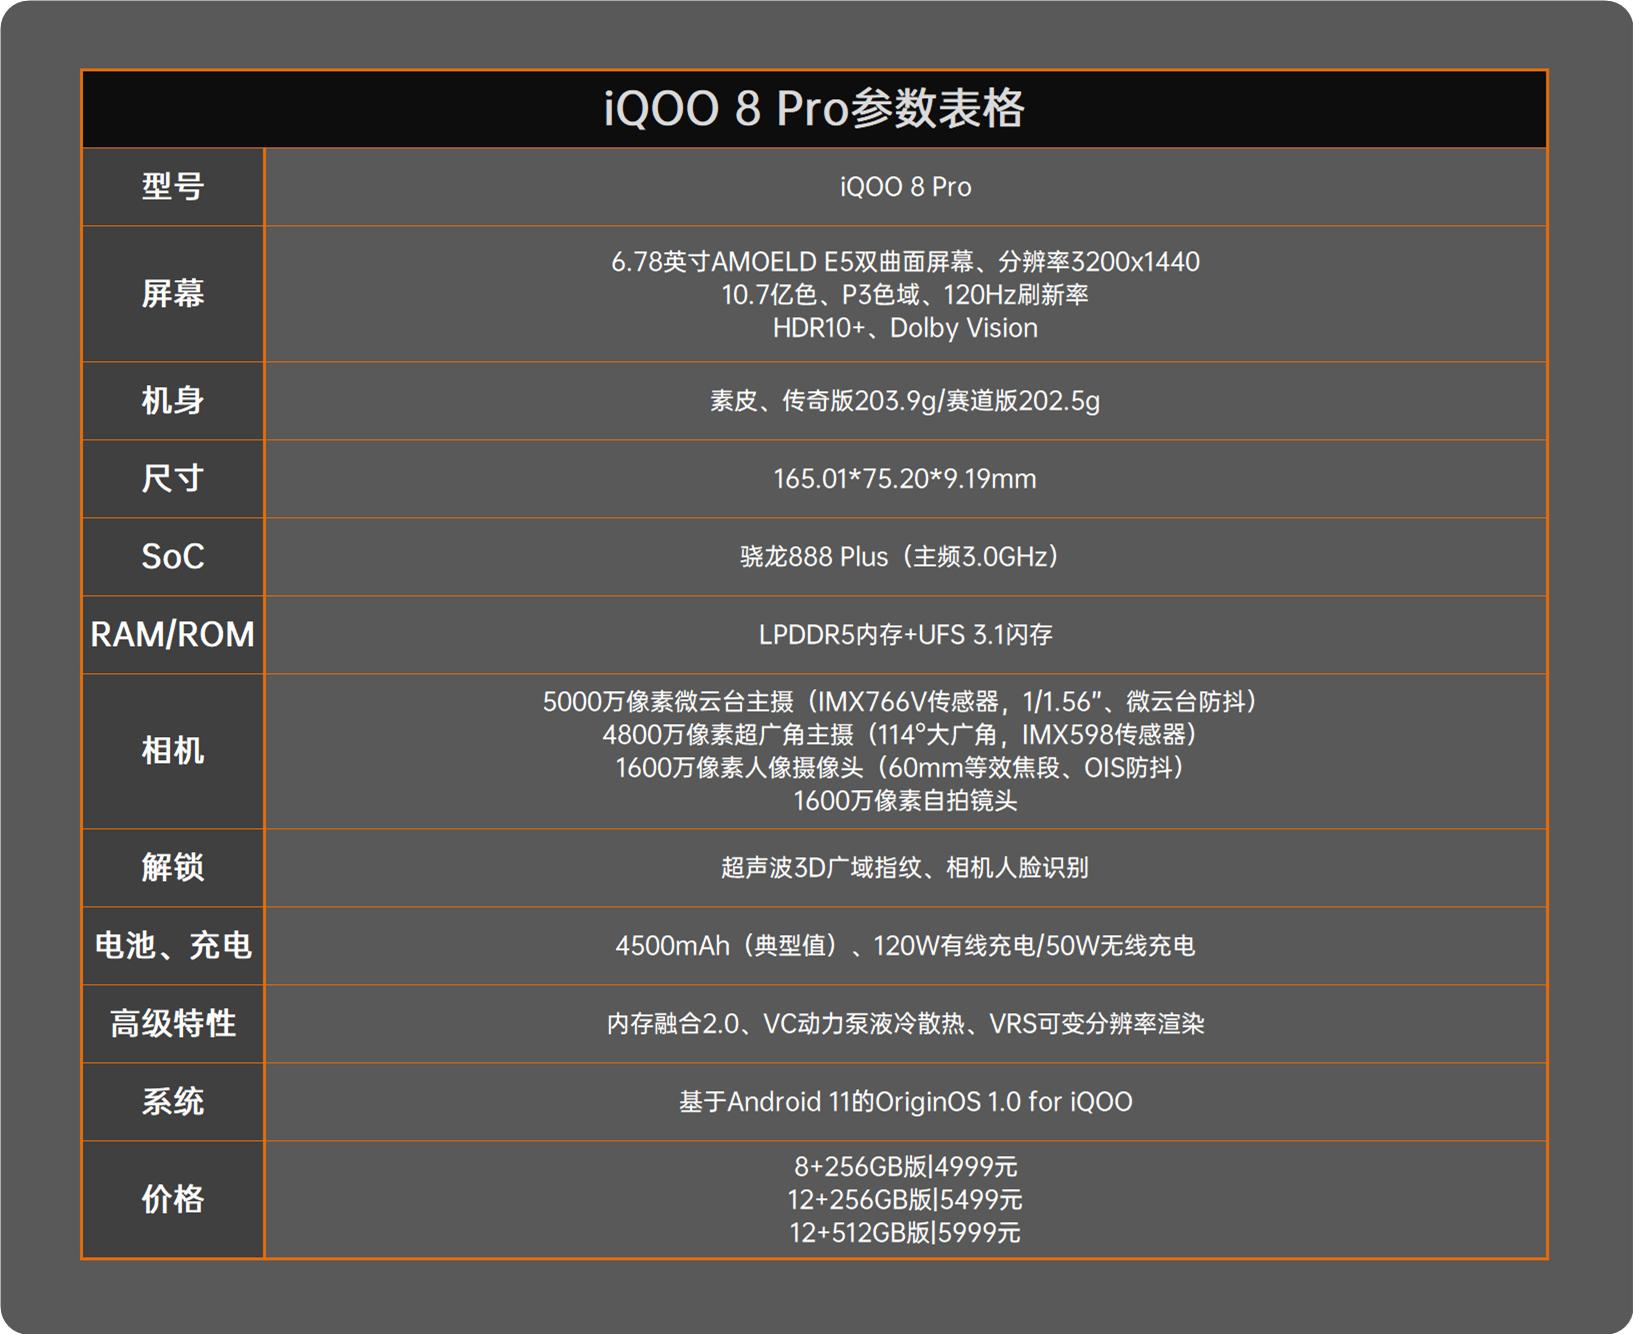 iQOO 8 Pro评测:再登性能之巅、跻身顶级之列